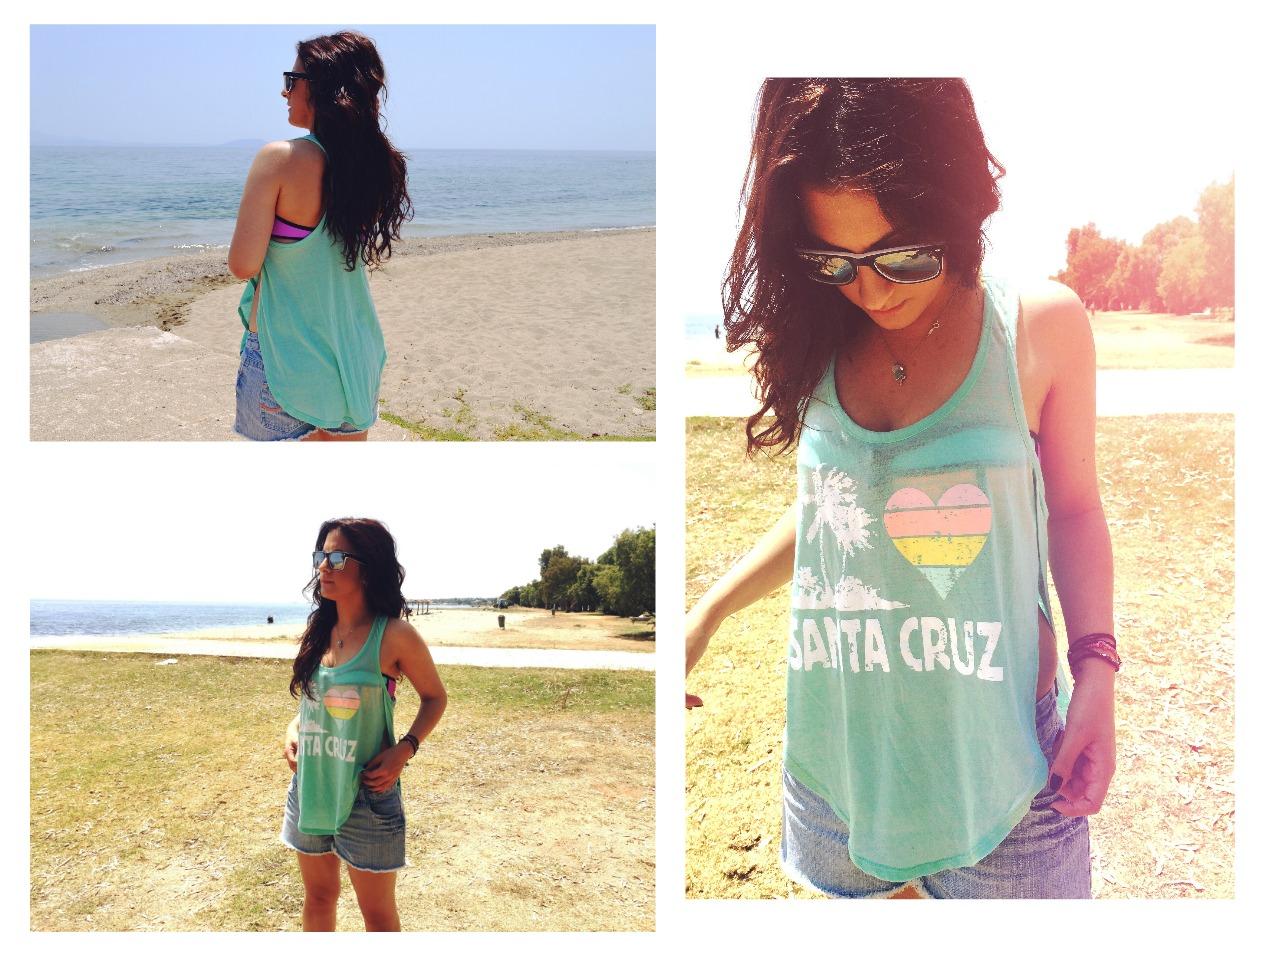 santa-cruz-ocean-drive-clothing